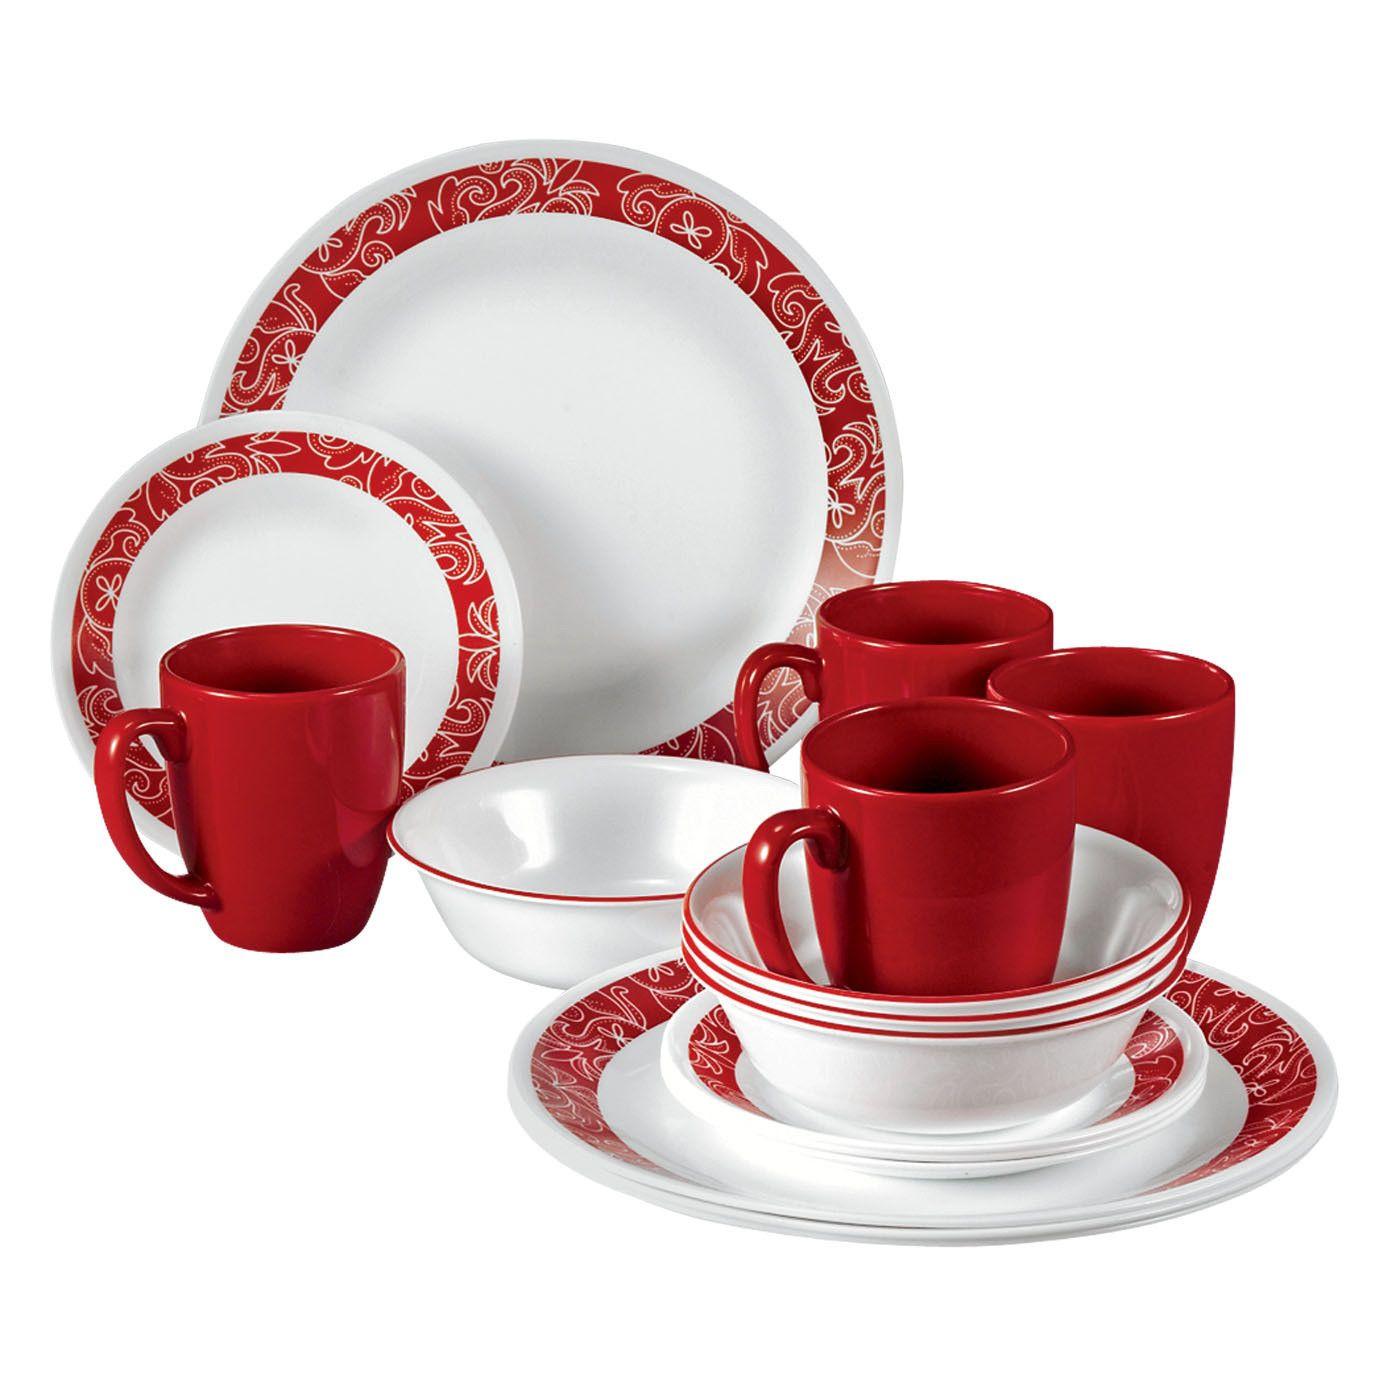 Shopko Corelle Dishes